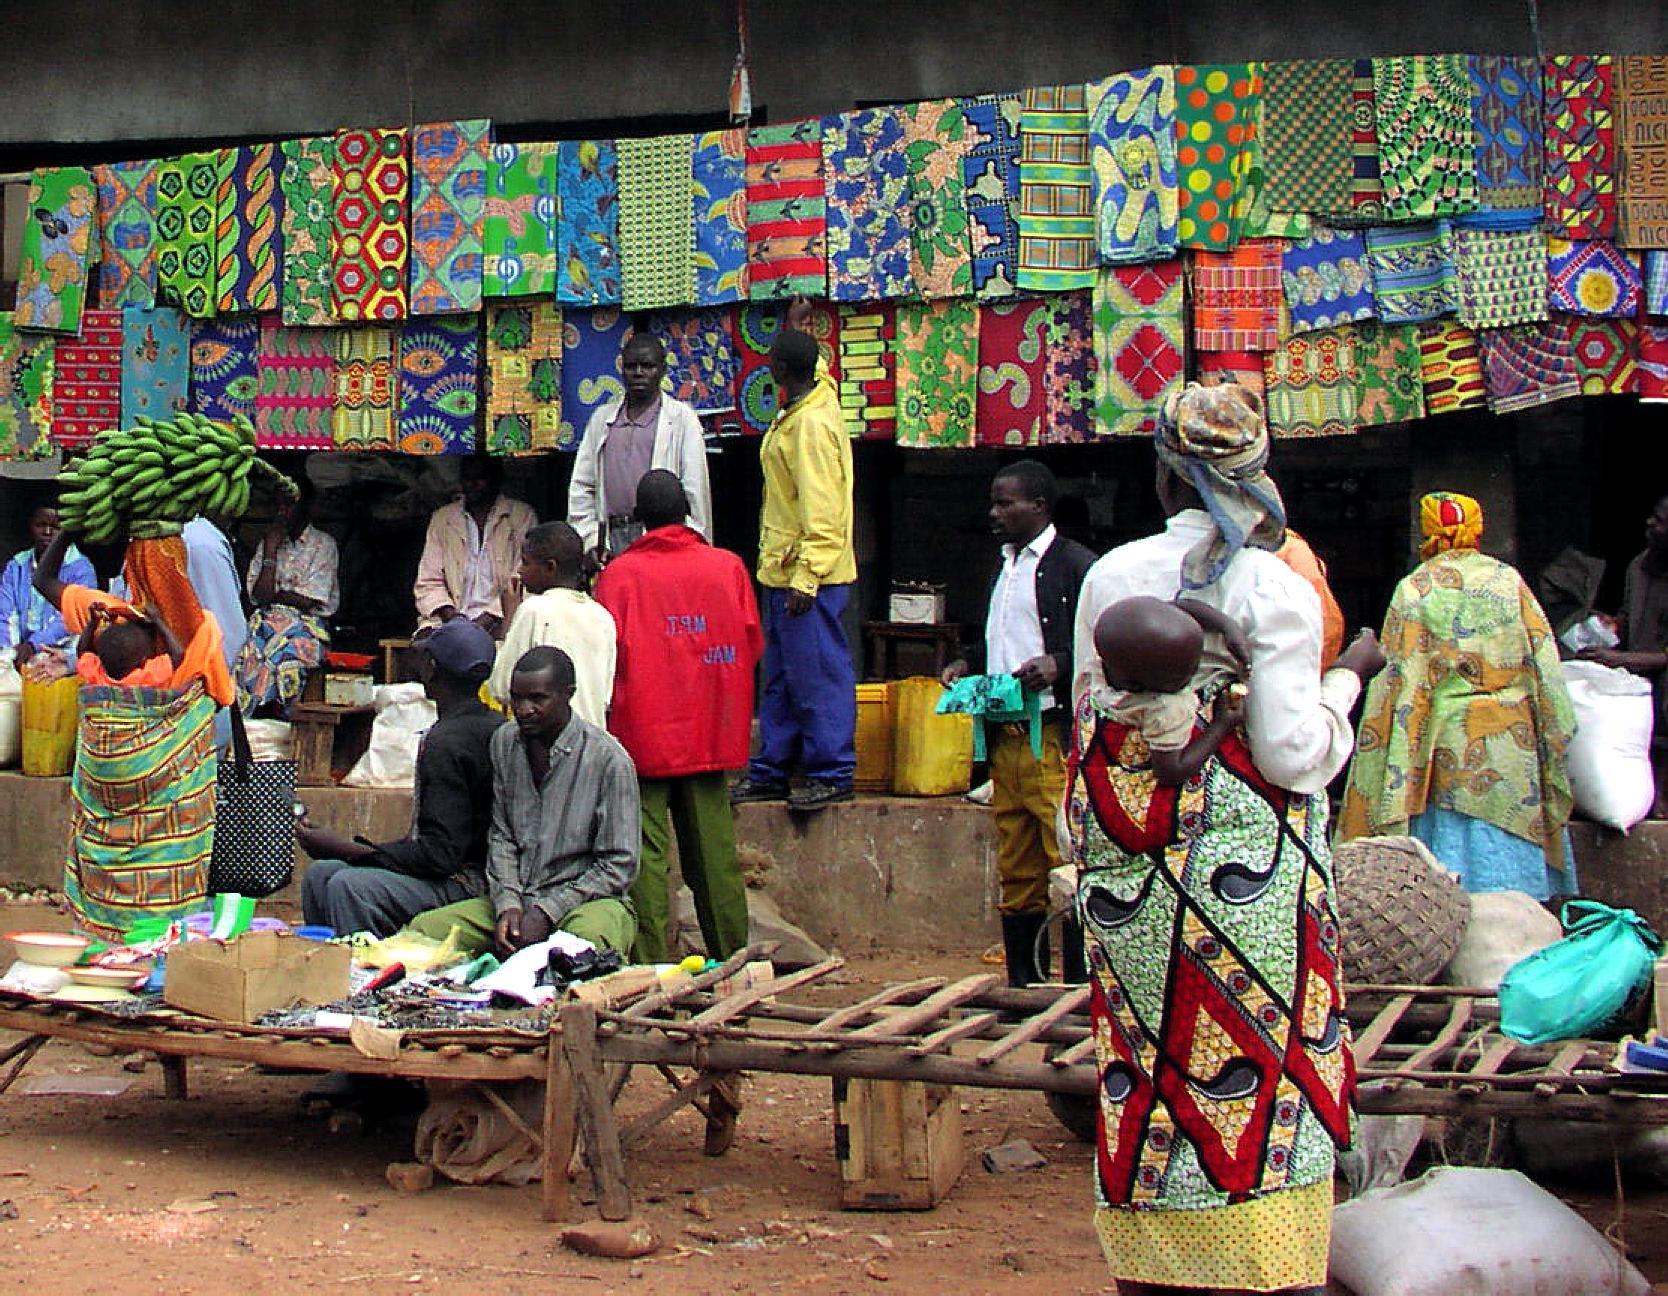 Free picture rwanda market scene open markets businesses